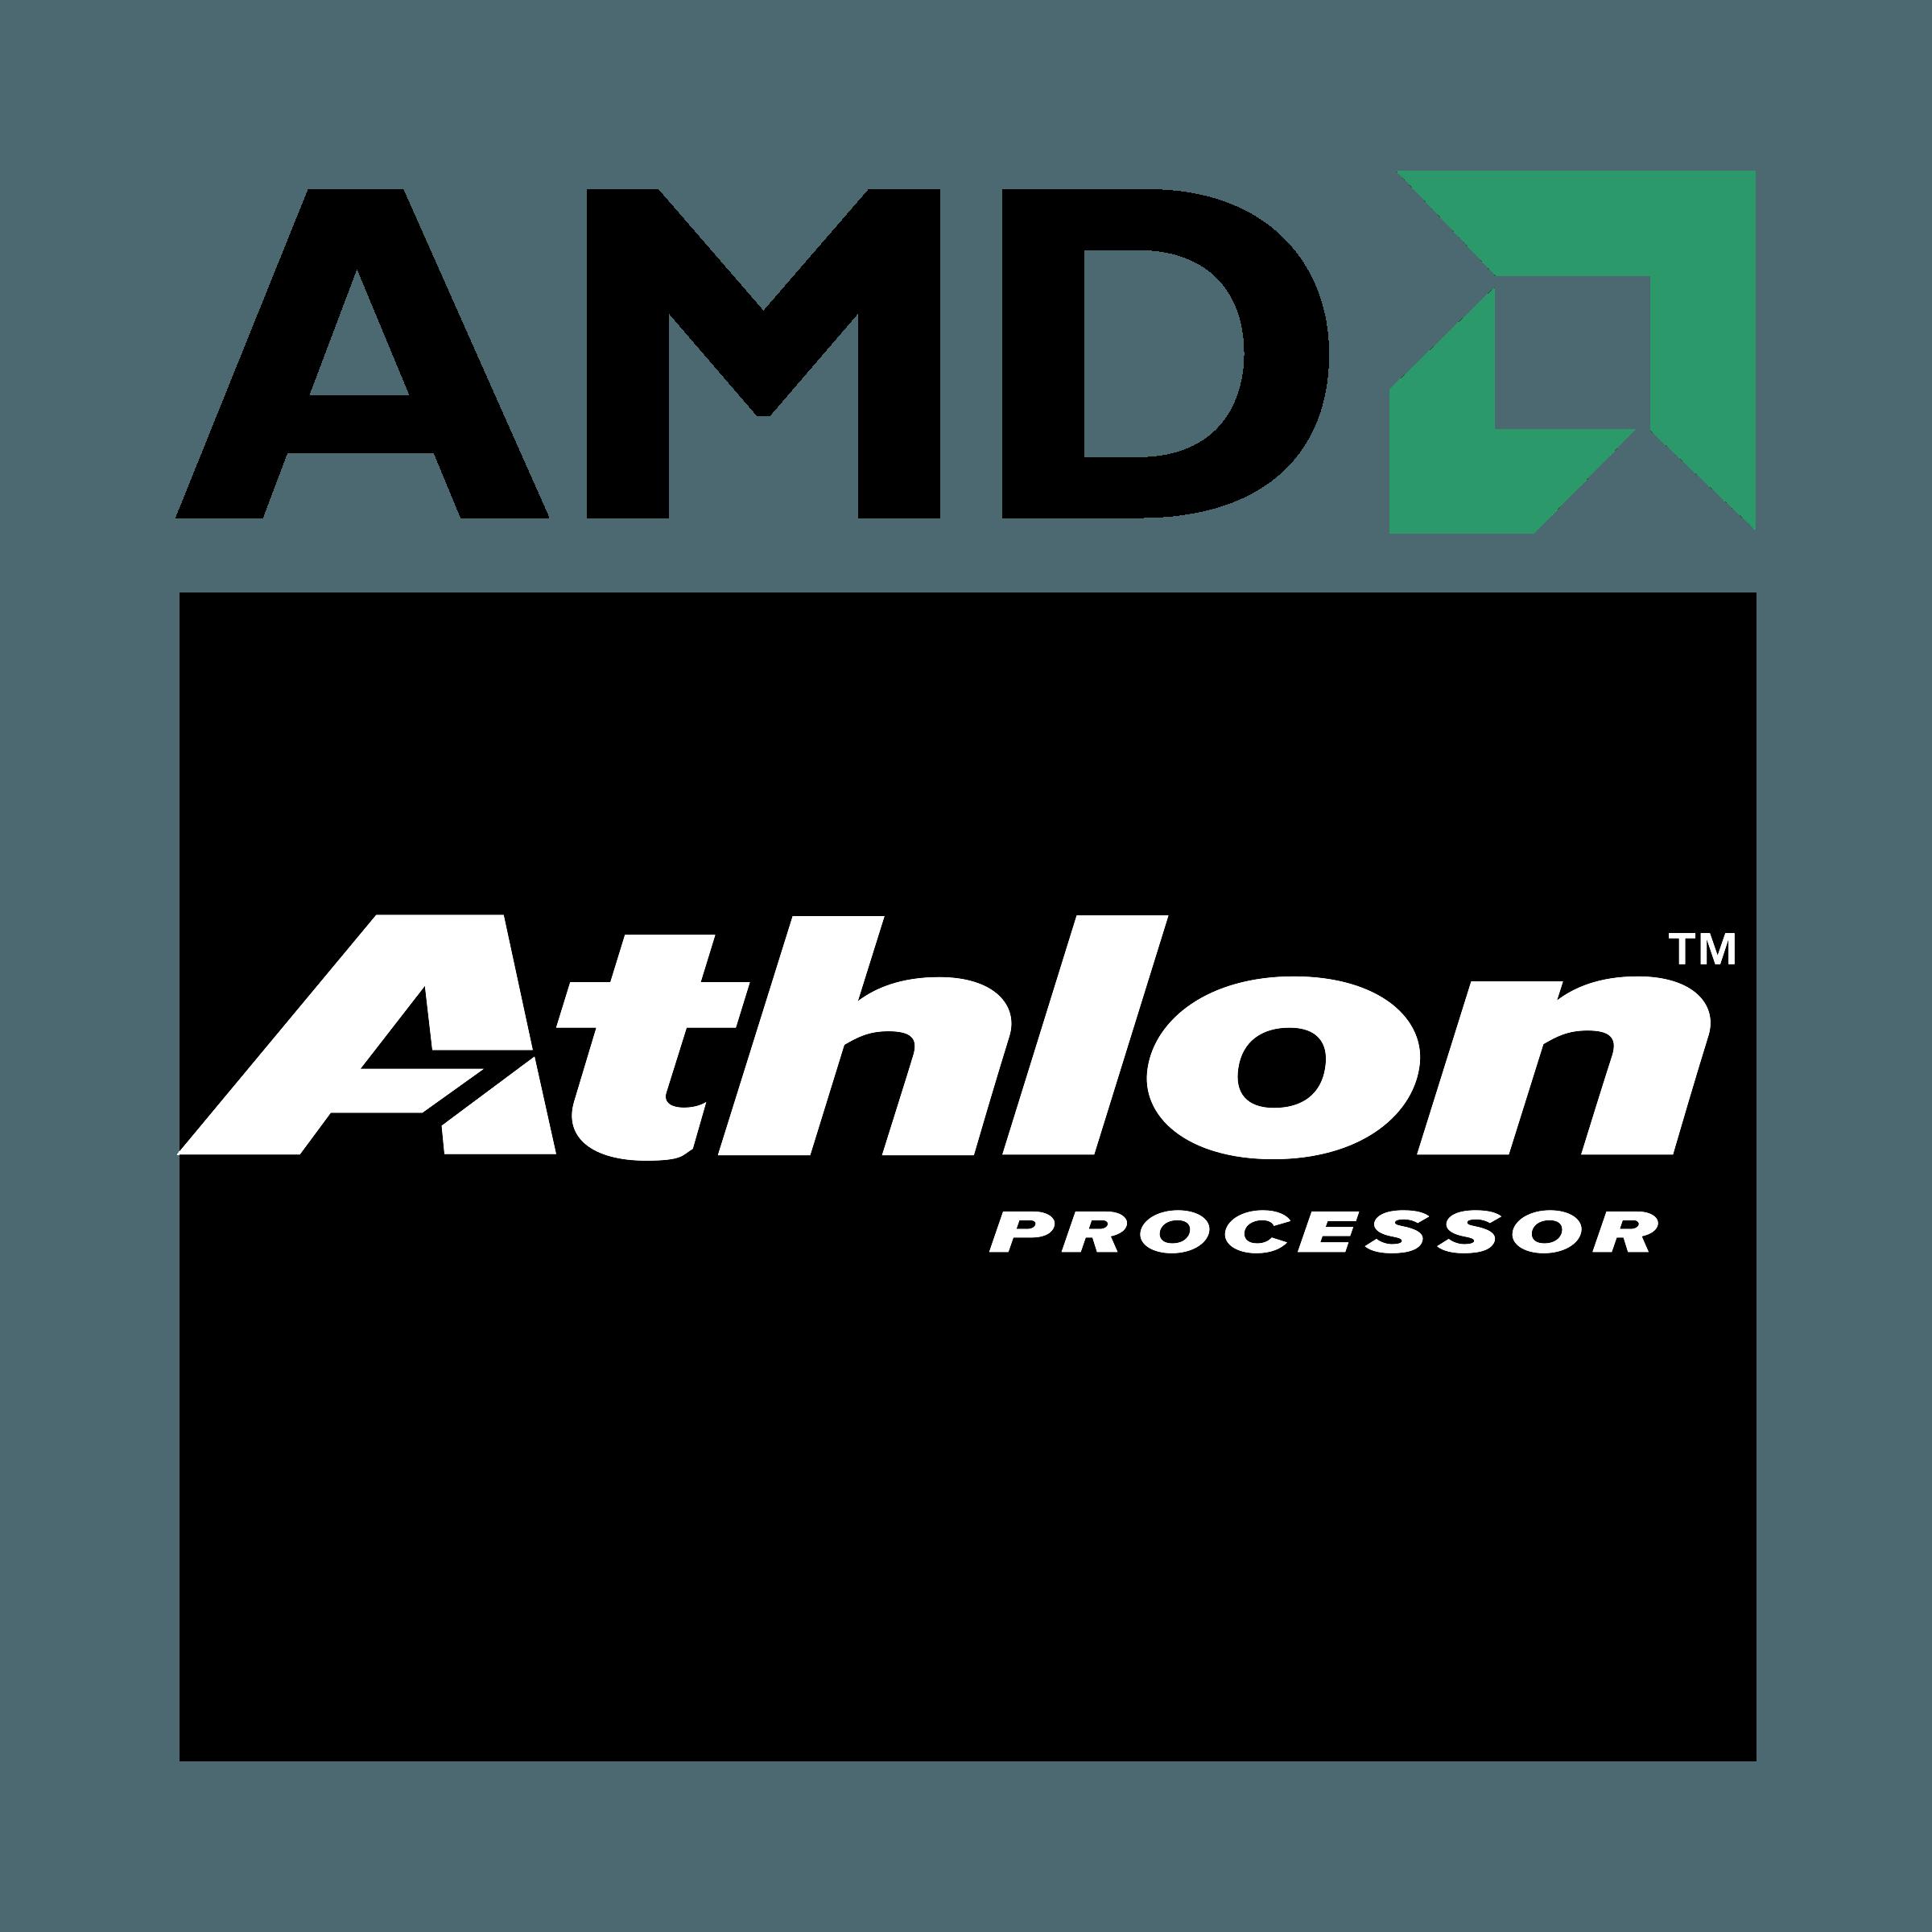 Transparent AMD Logo - LogoDix